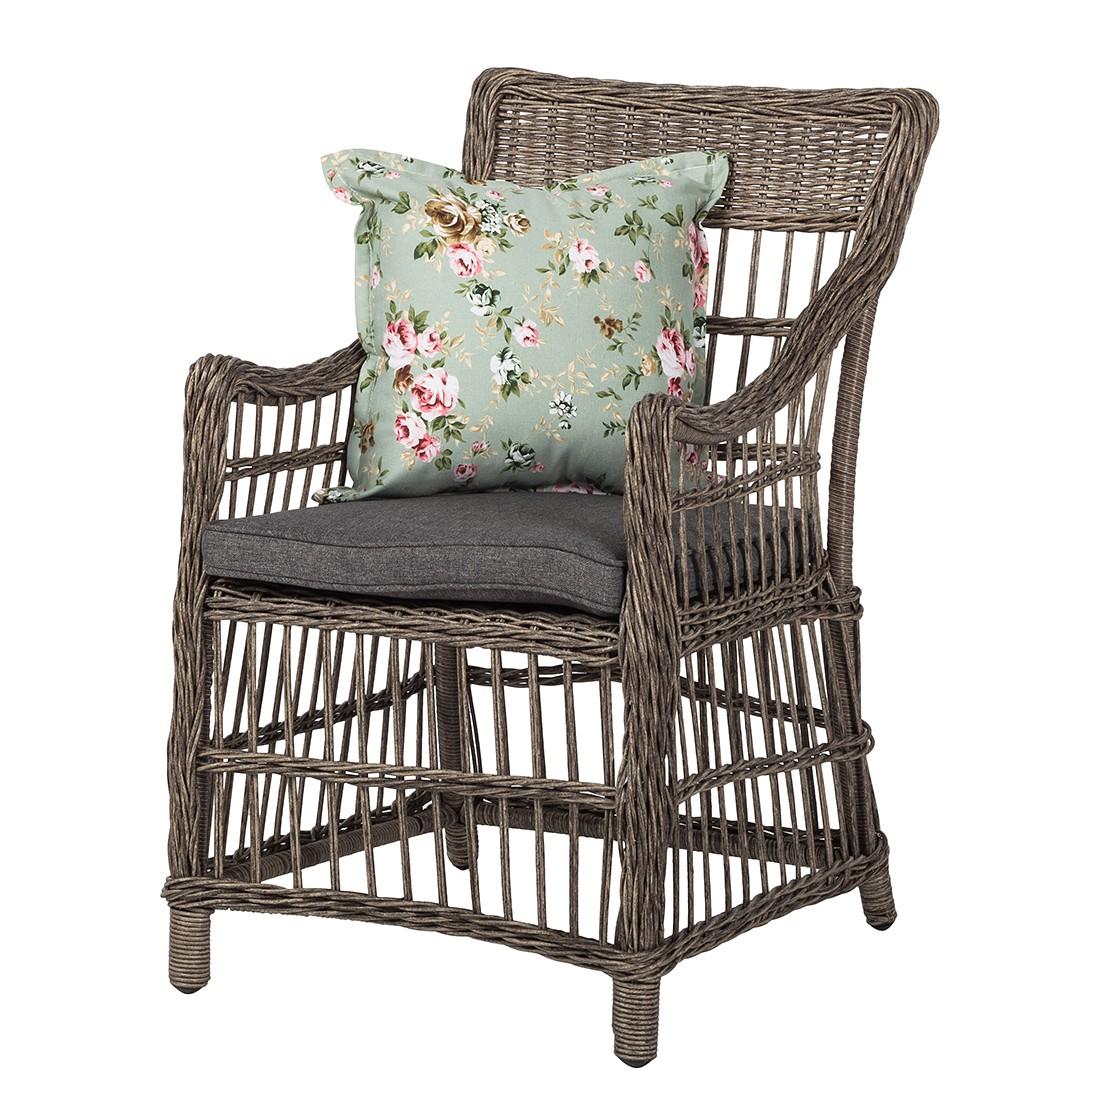 gartensessel rose bay polyrattan braun ebay. Black Bedroom Furniture Sets. Home Design Ideas